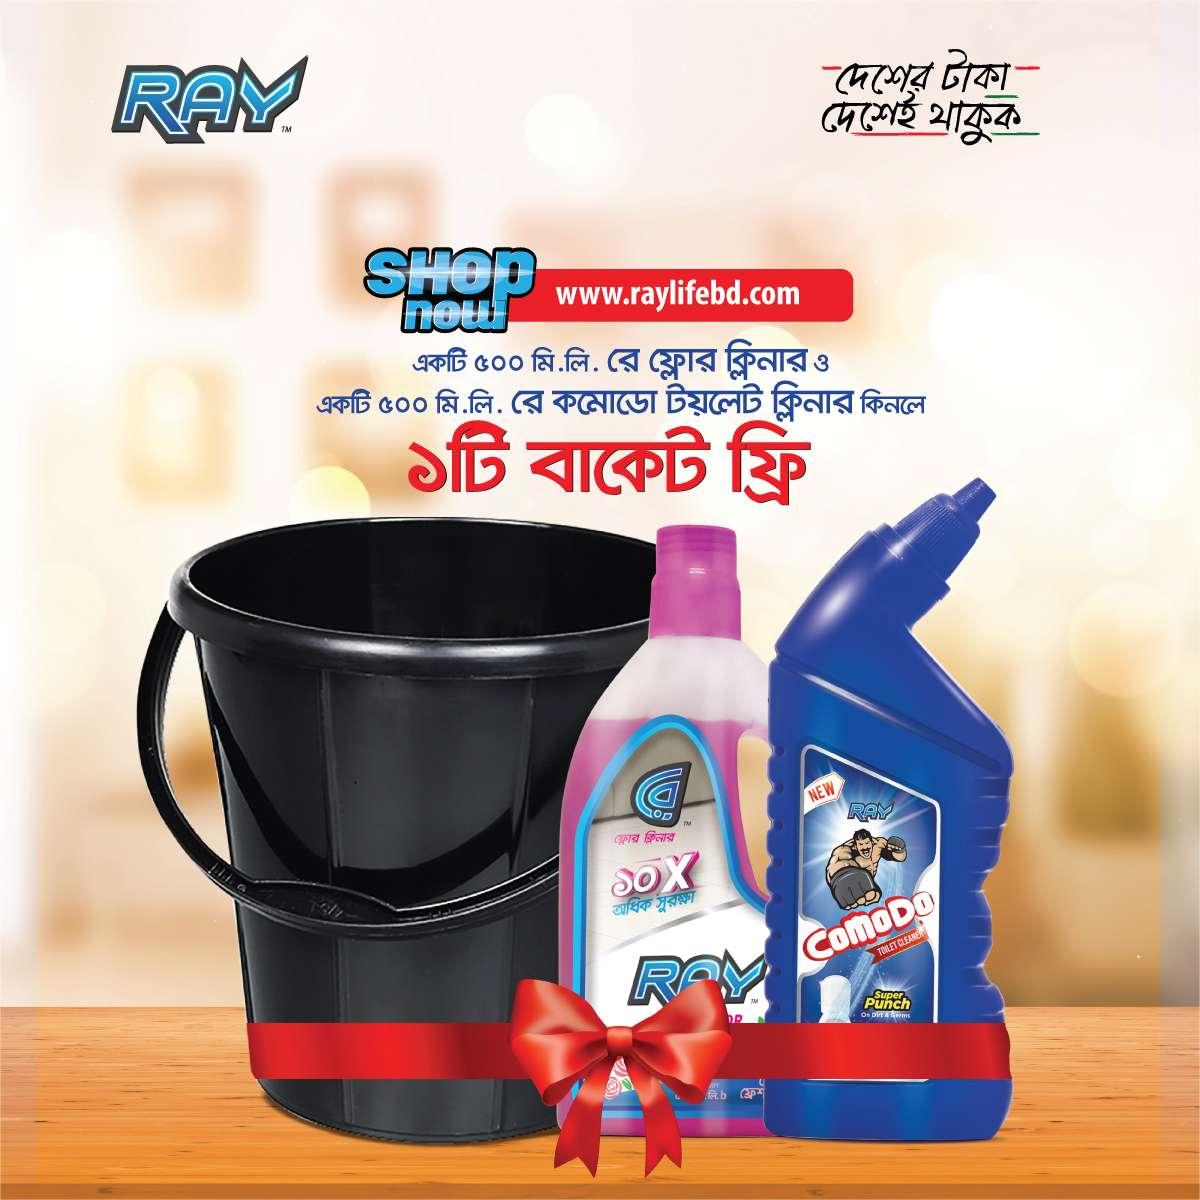 Buy Floor Cleaner 500 ml & Toilet Cleaner 500 ml and Get free Bucket